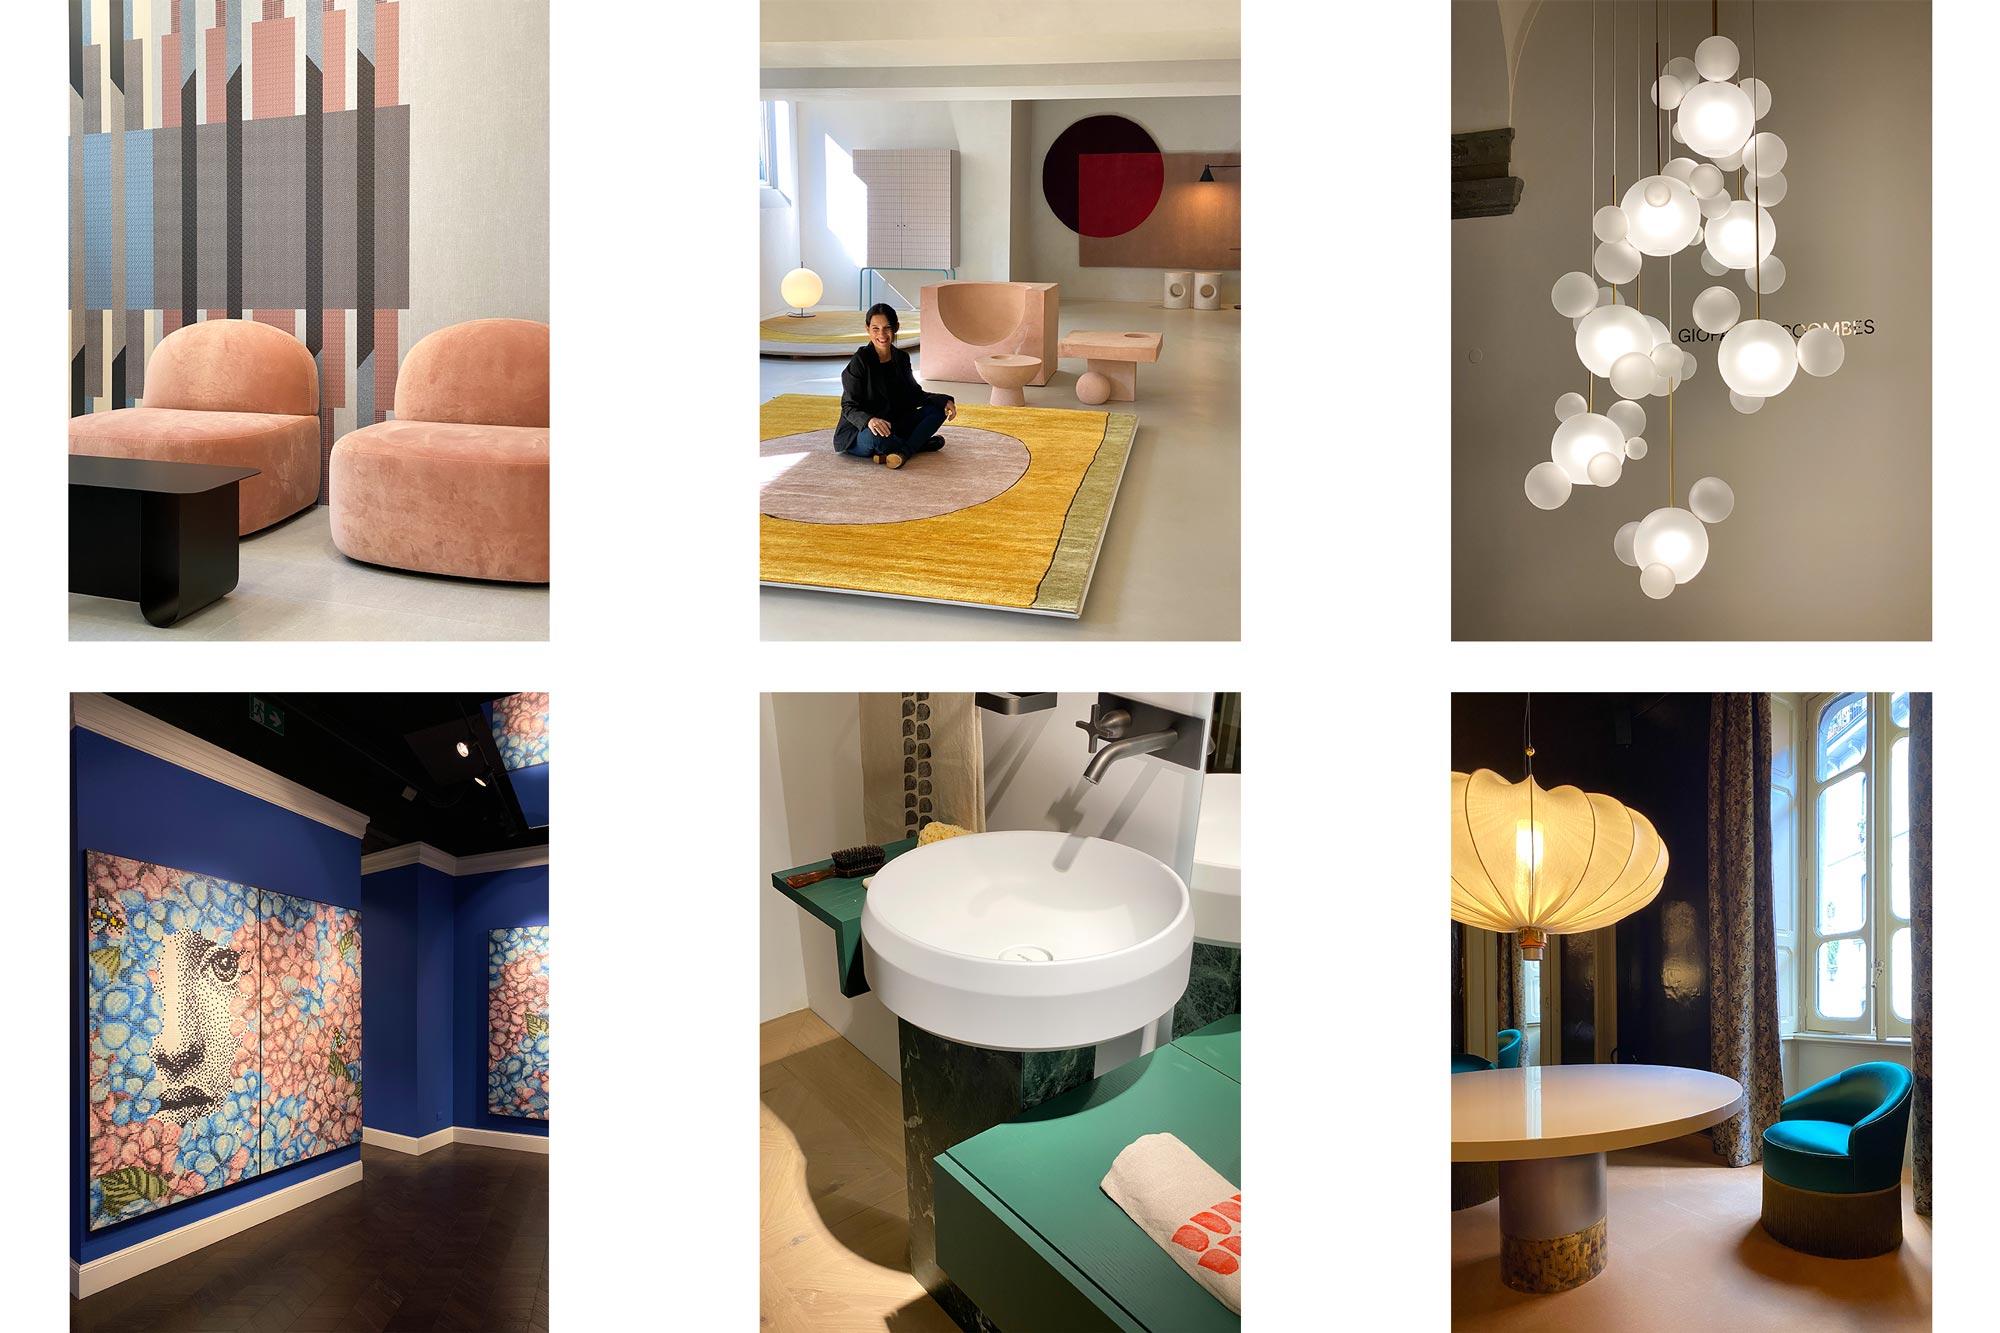 Milano Design City 2020 by Casum on Instagram: Cedit, Amini, Giopato & Coombes, Bisazza Fornasetti, Agape, Dimoremilano